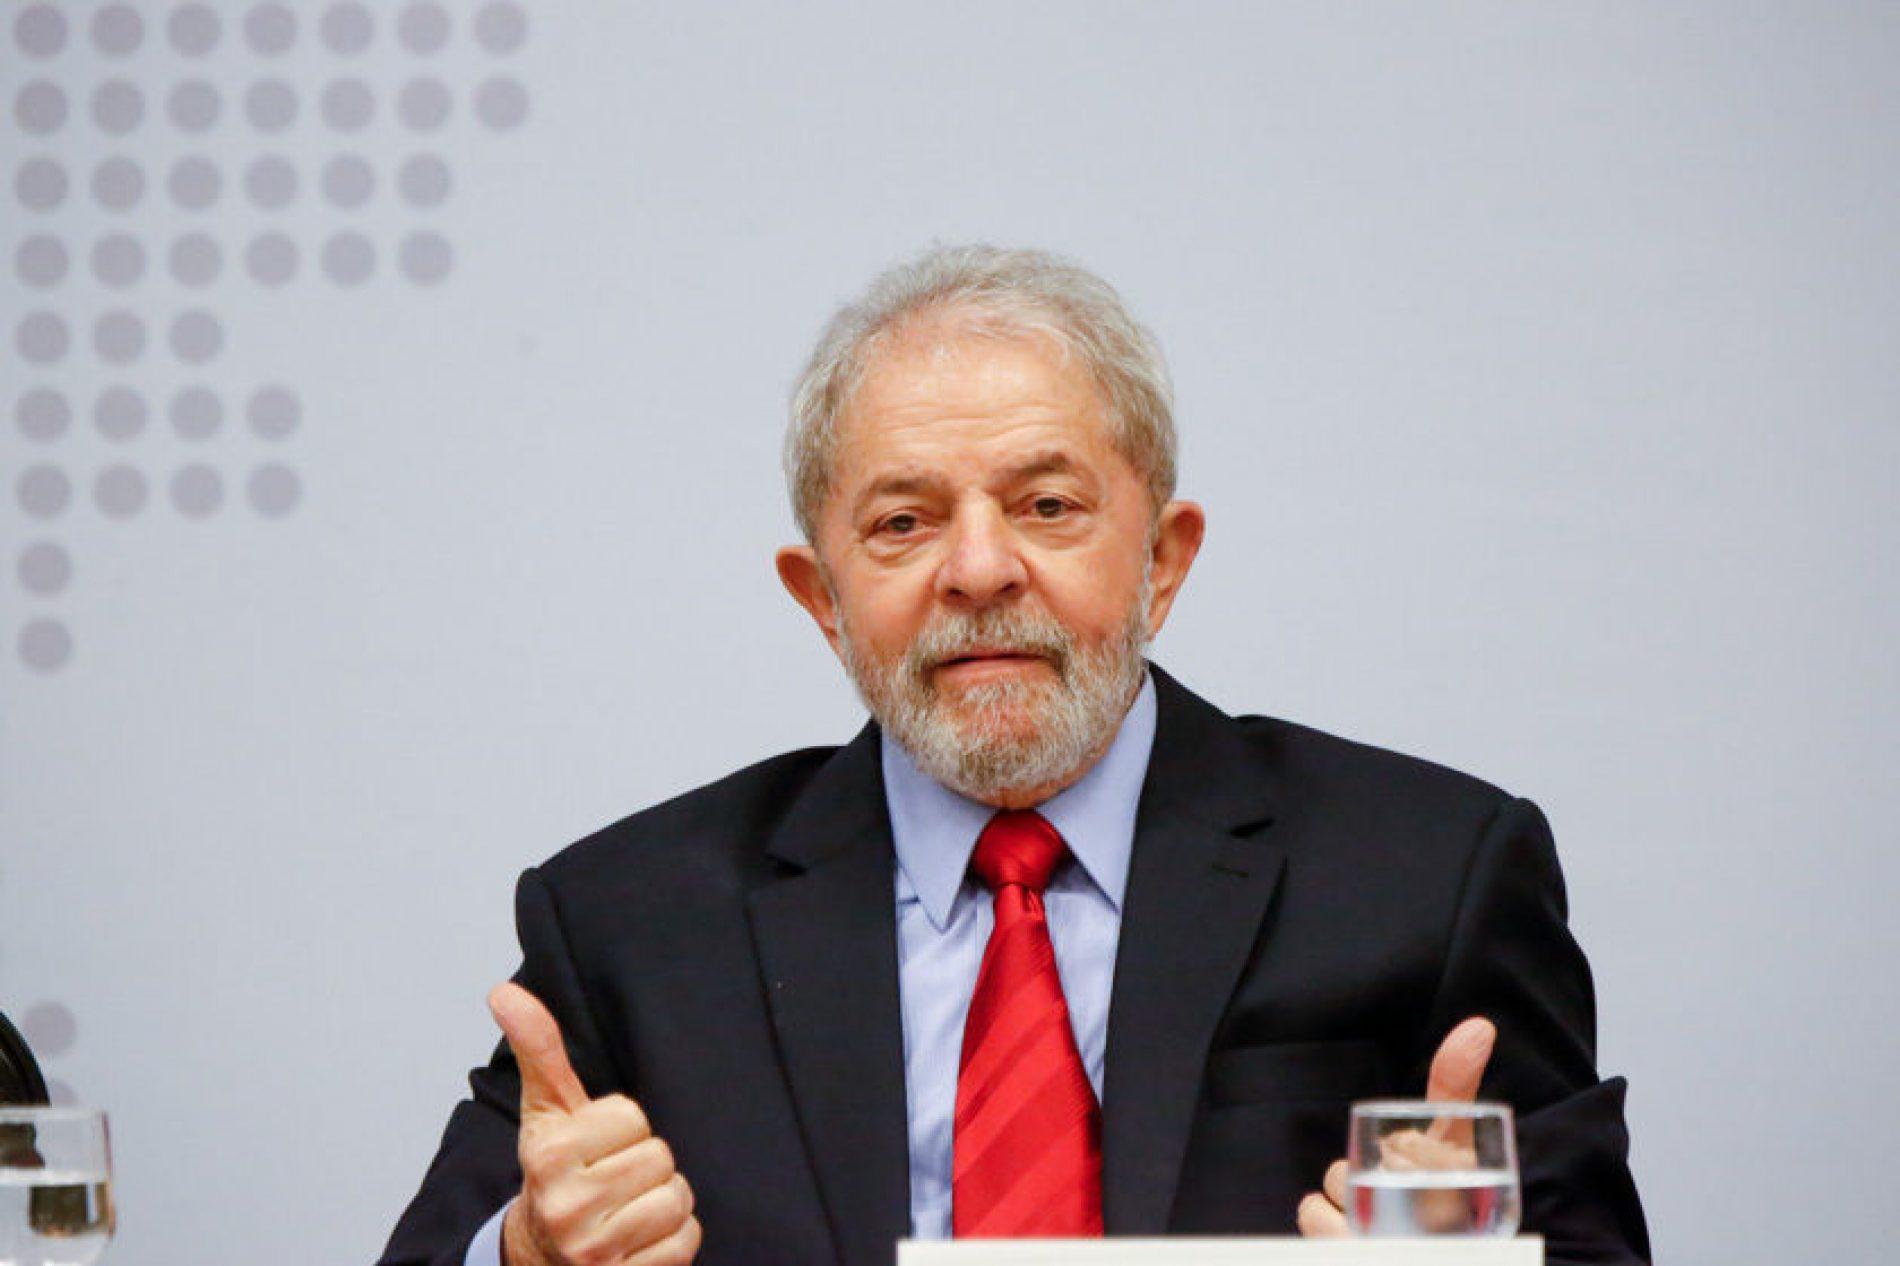 Moro desbloqueia aposentadoria de Lula